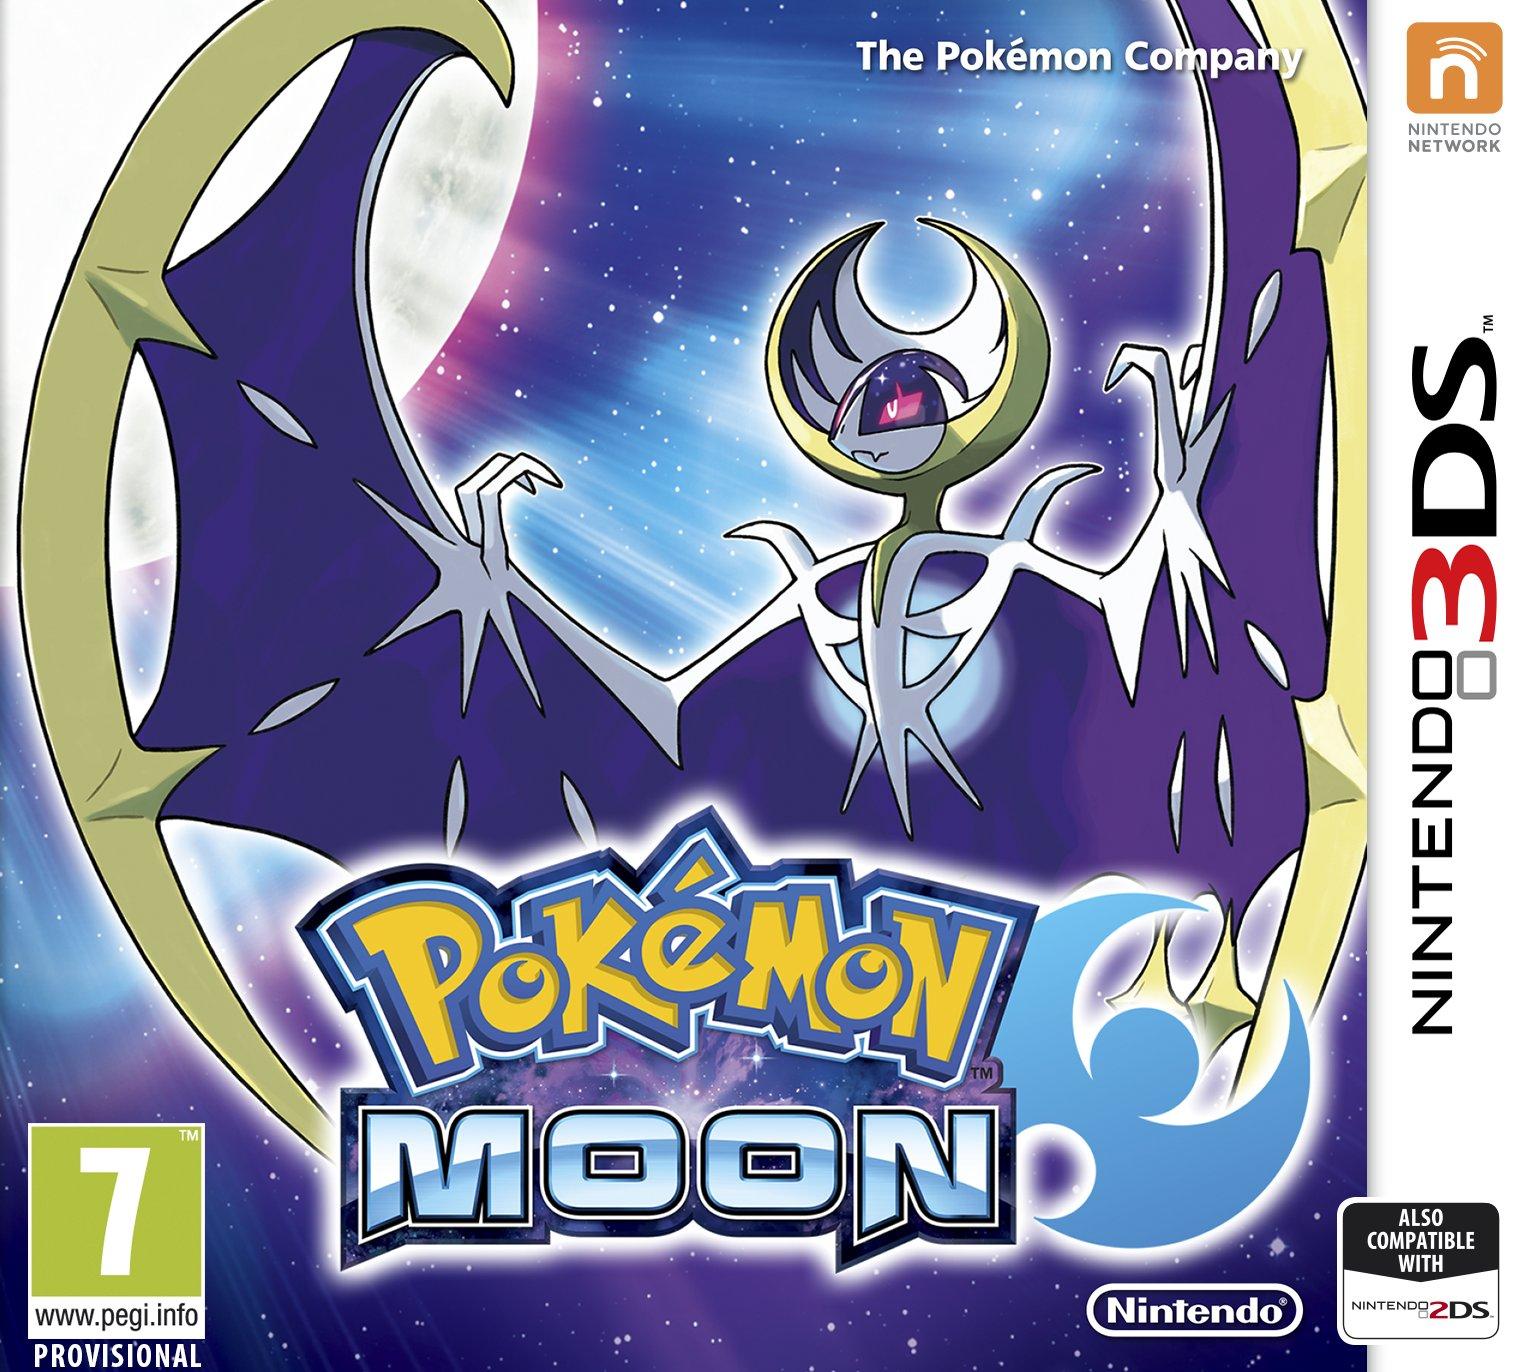 moonboxbig.jpg